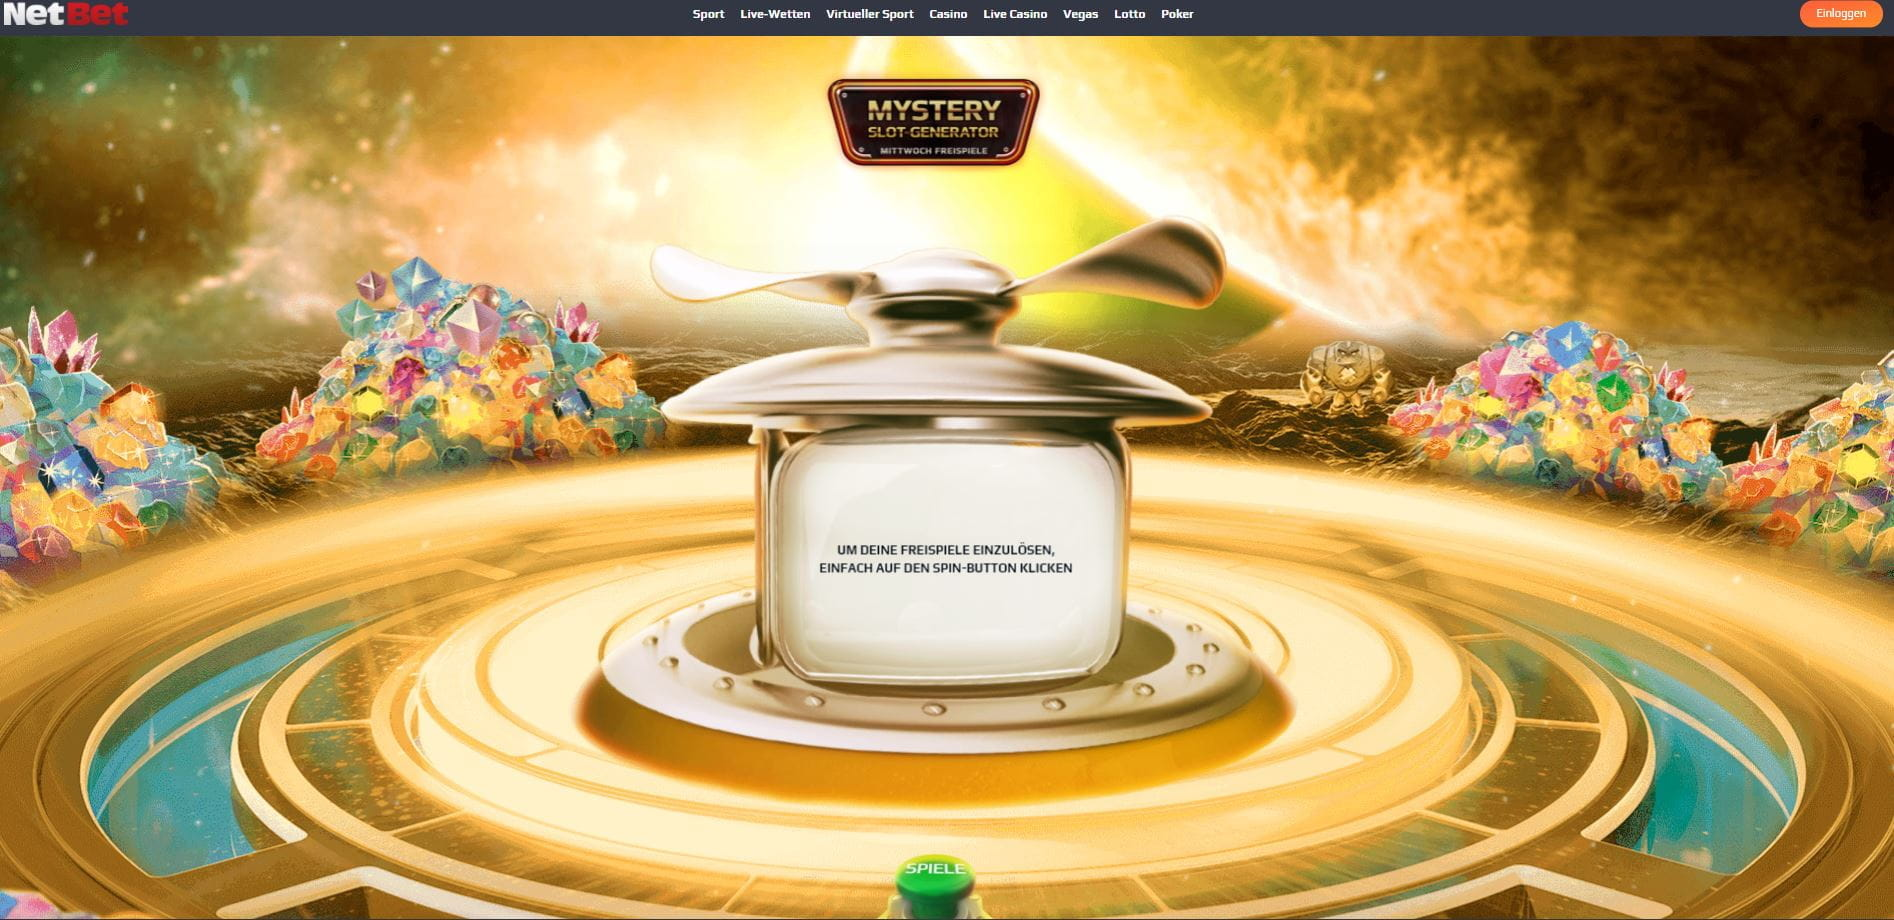 NetBet Aktion Mystery Freispiel Generator